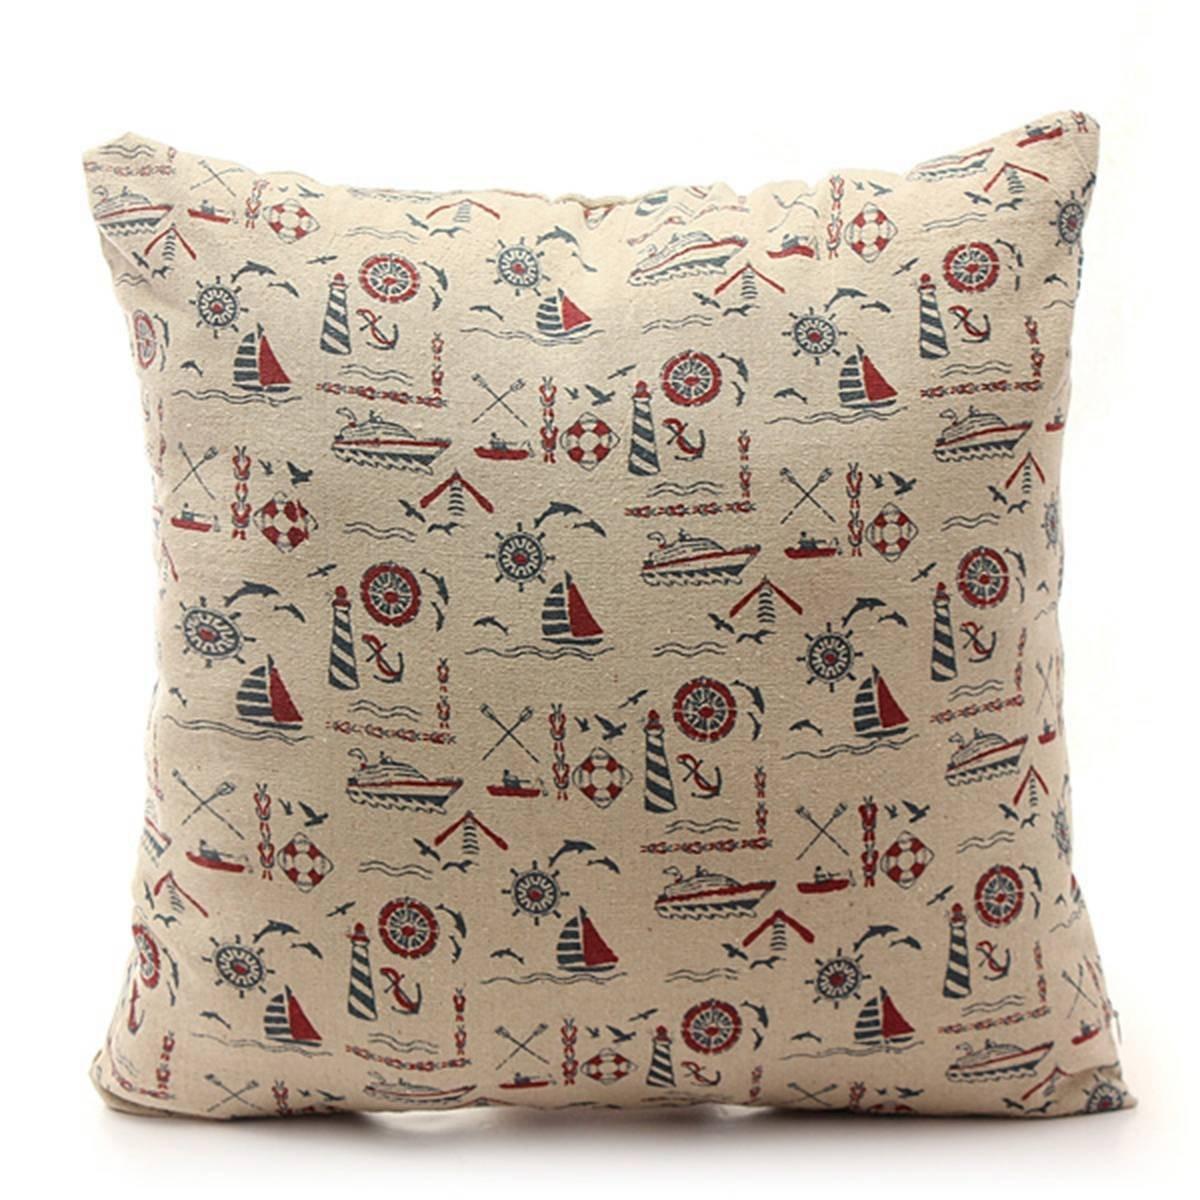 Retro European Cotton Linen Cushion Cover Throw Pillow Case Sofa Car Home Decor 42cmX42cm Nautical Boat Pattern